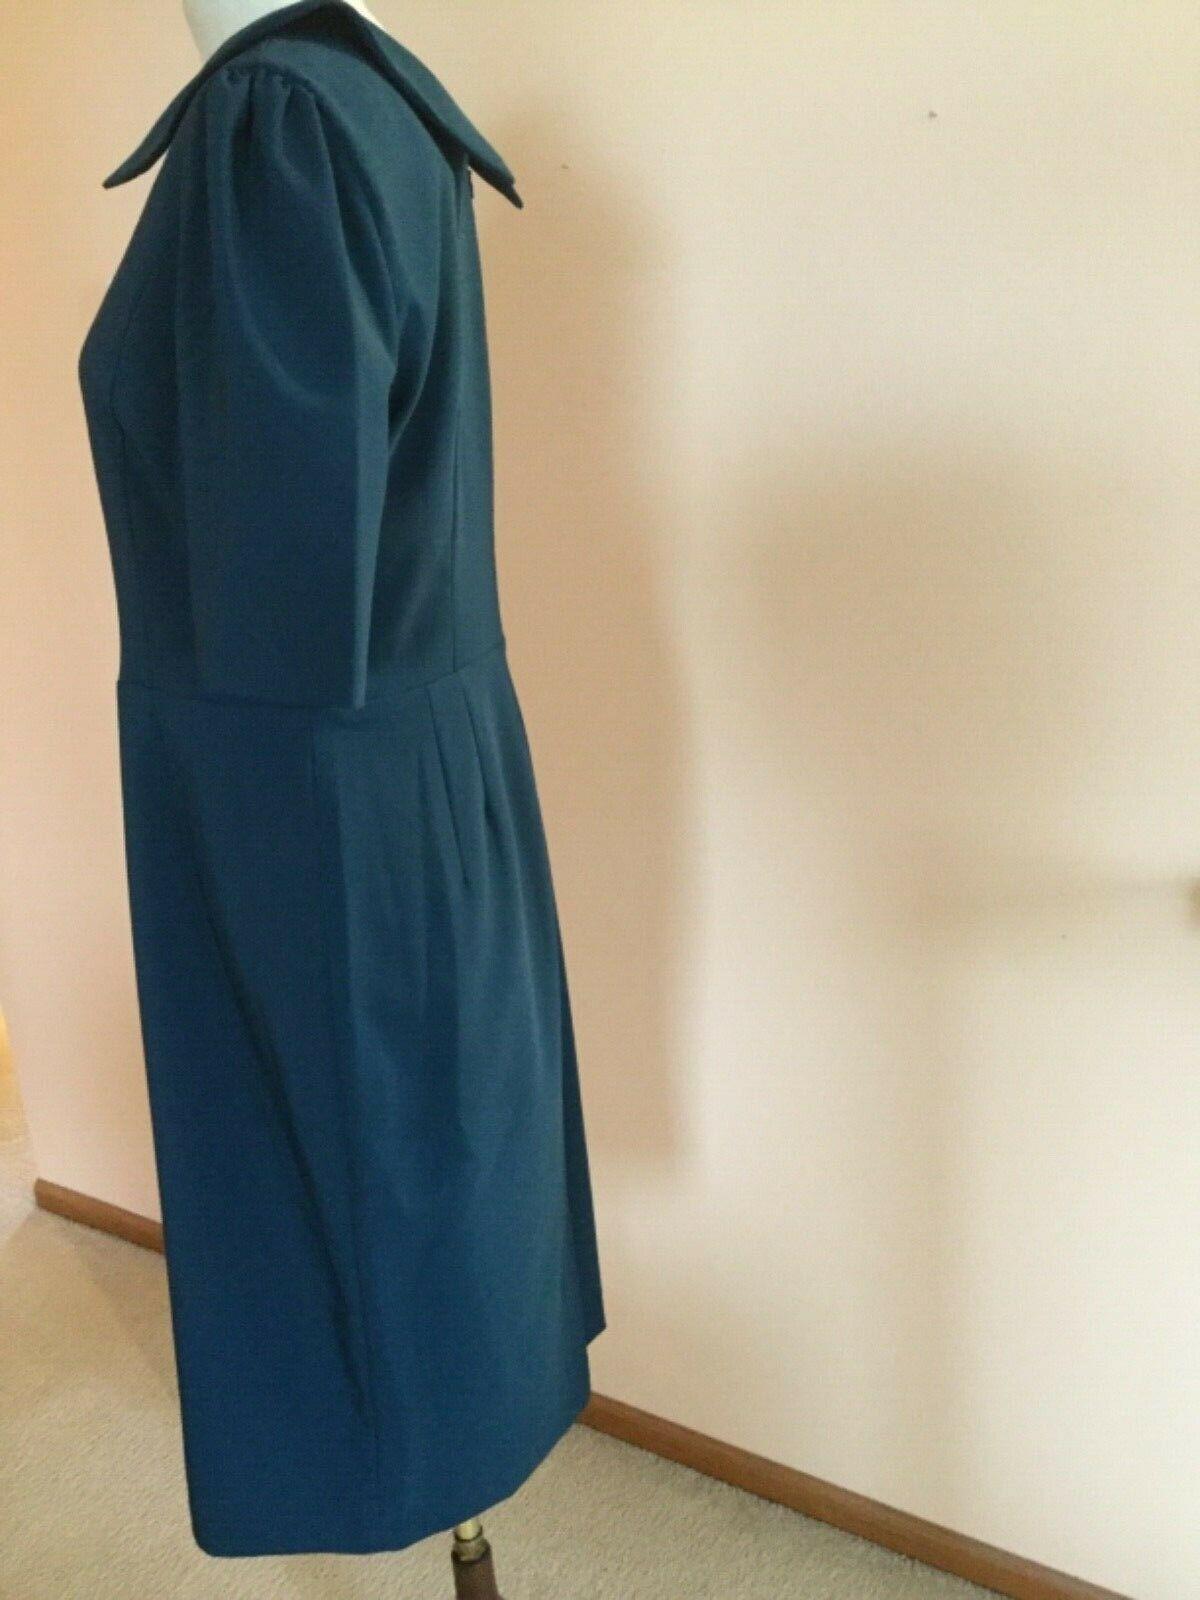 Women's Dress,XL,Green,,Long Sleeves ,Armani Collezioni,NWOT image 2